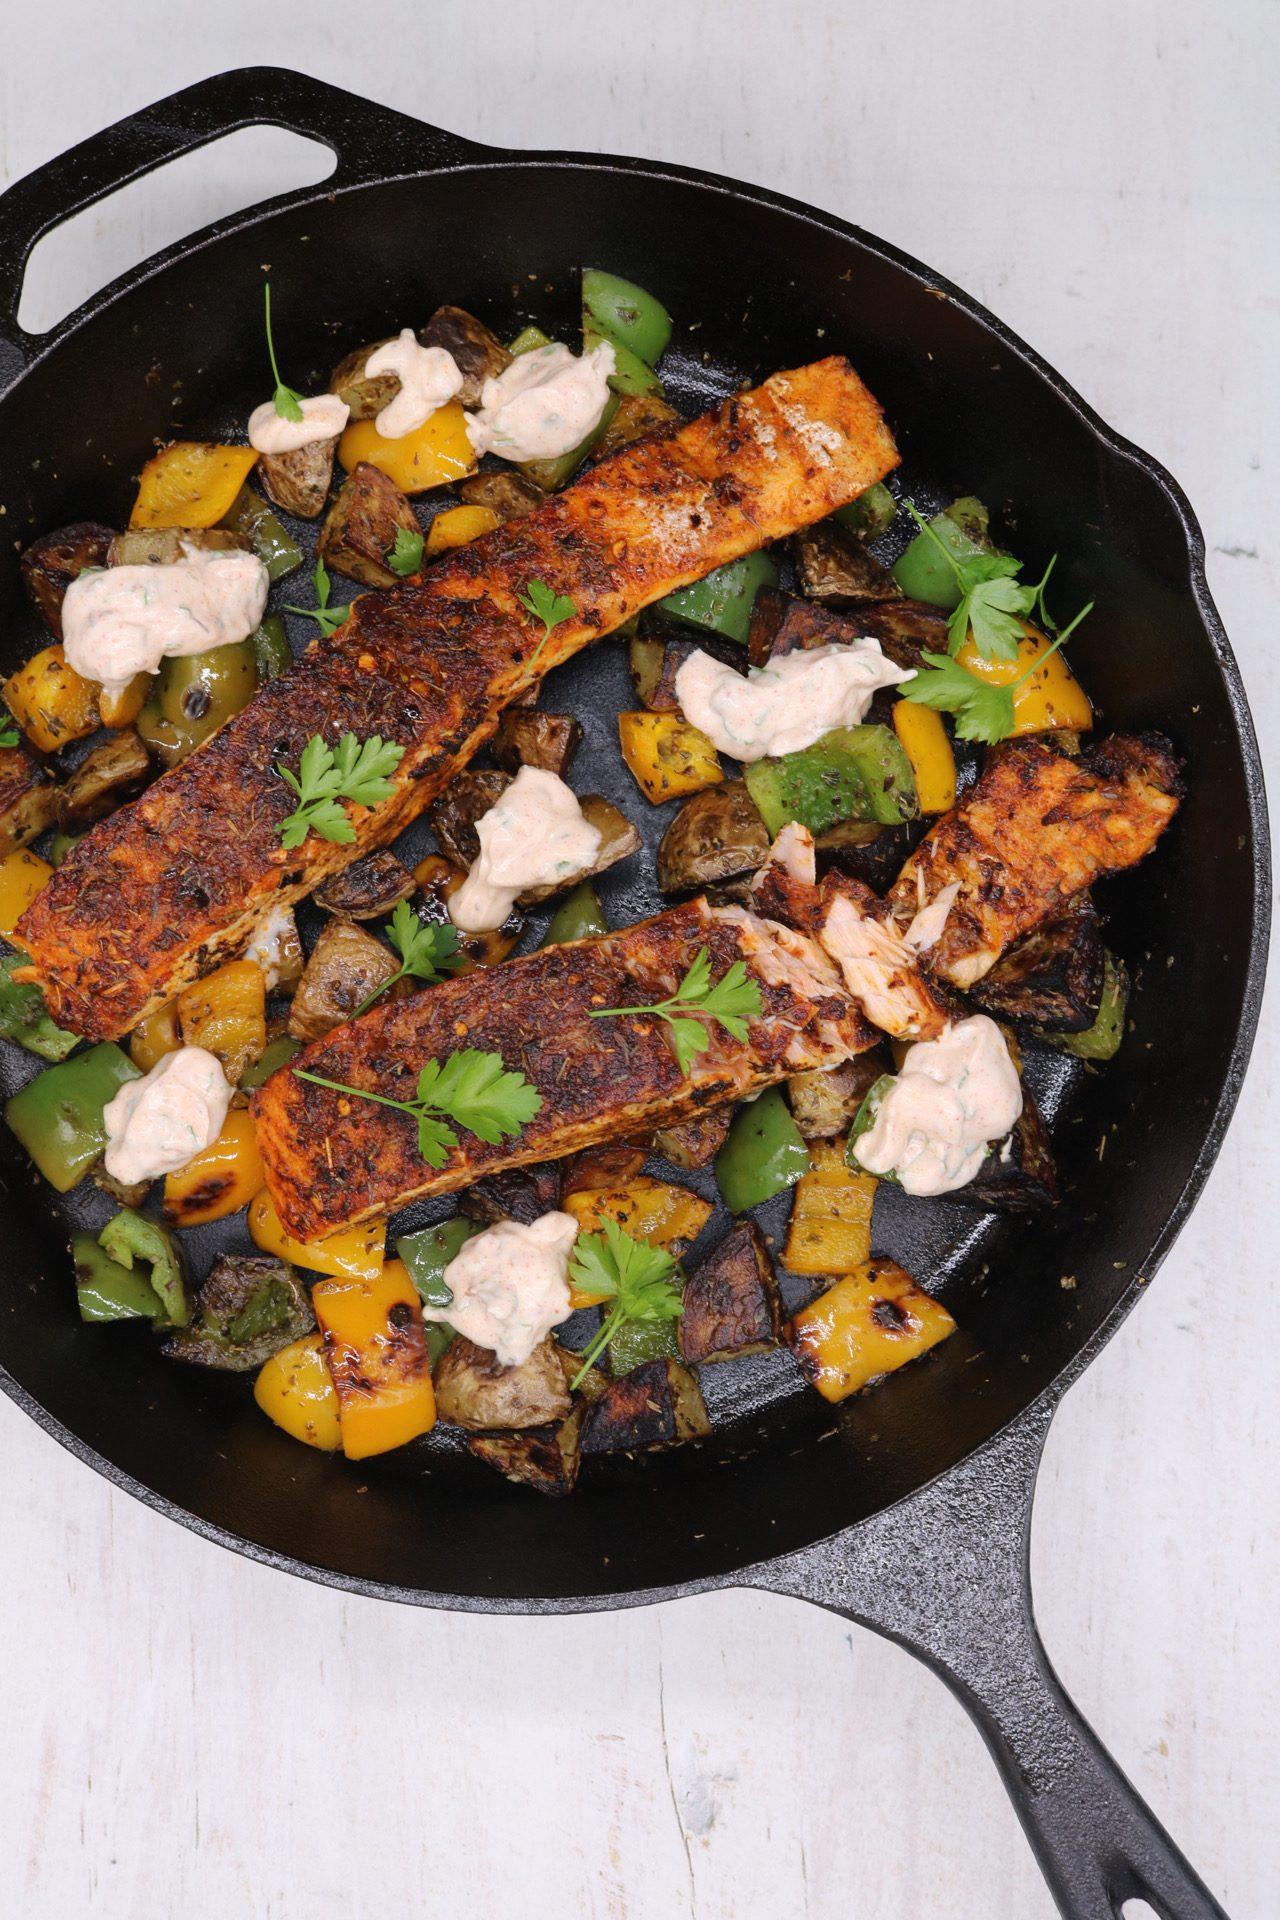 Cajun-Style Charred Salmon with Cowboy Potatoes, Cajun-Style Charred Salmon with Cowboy Potatoes